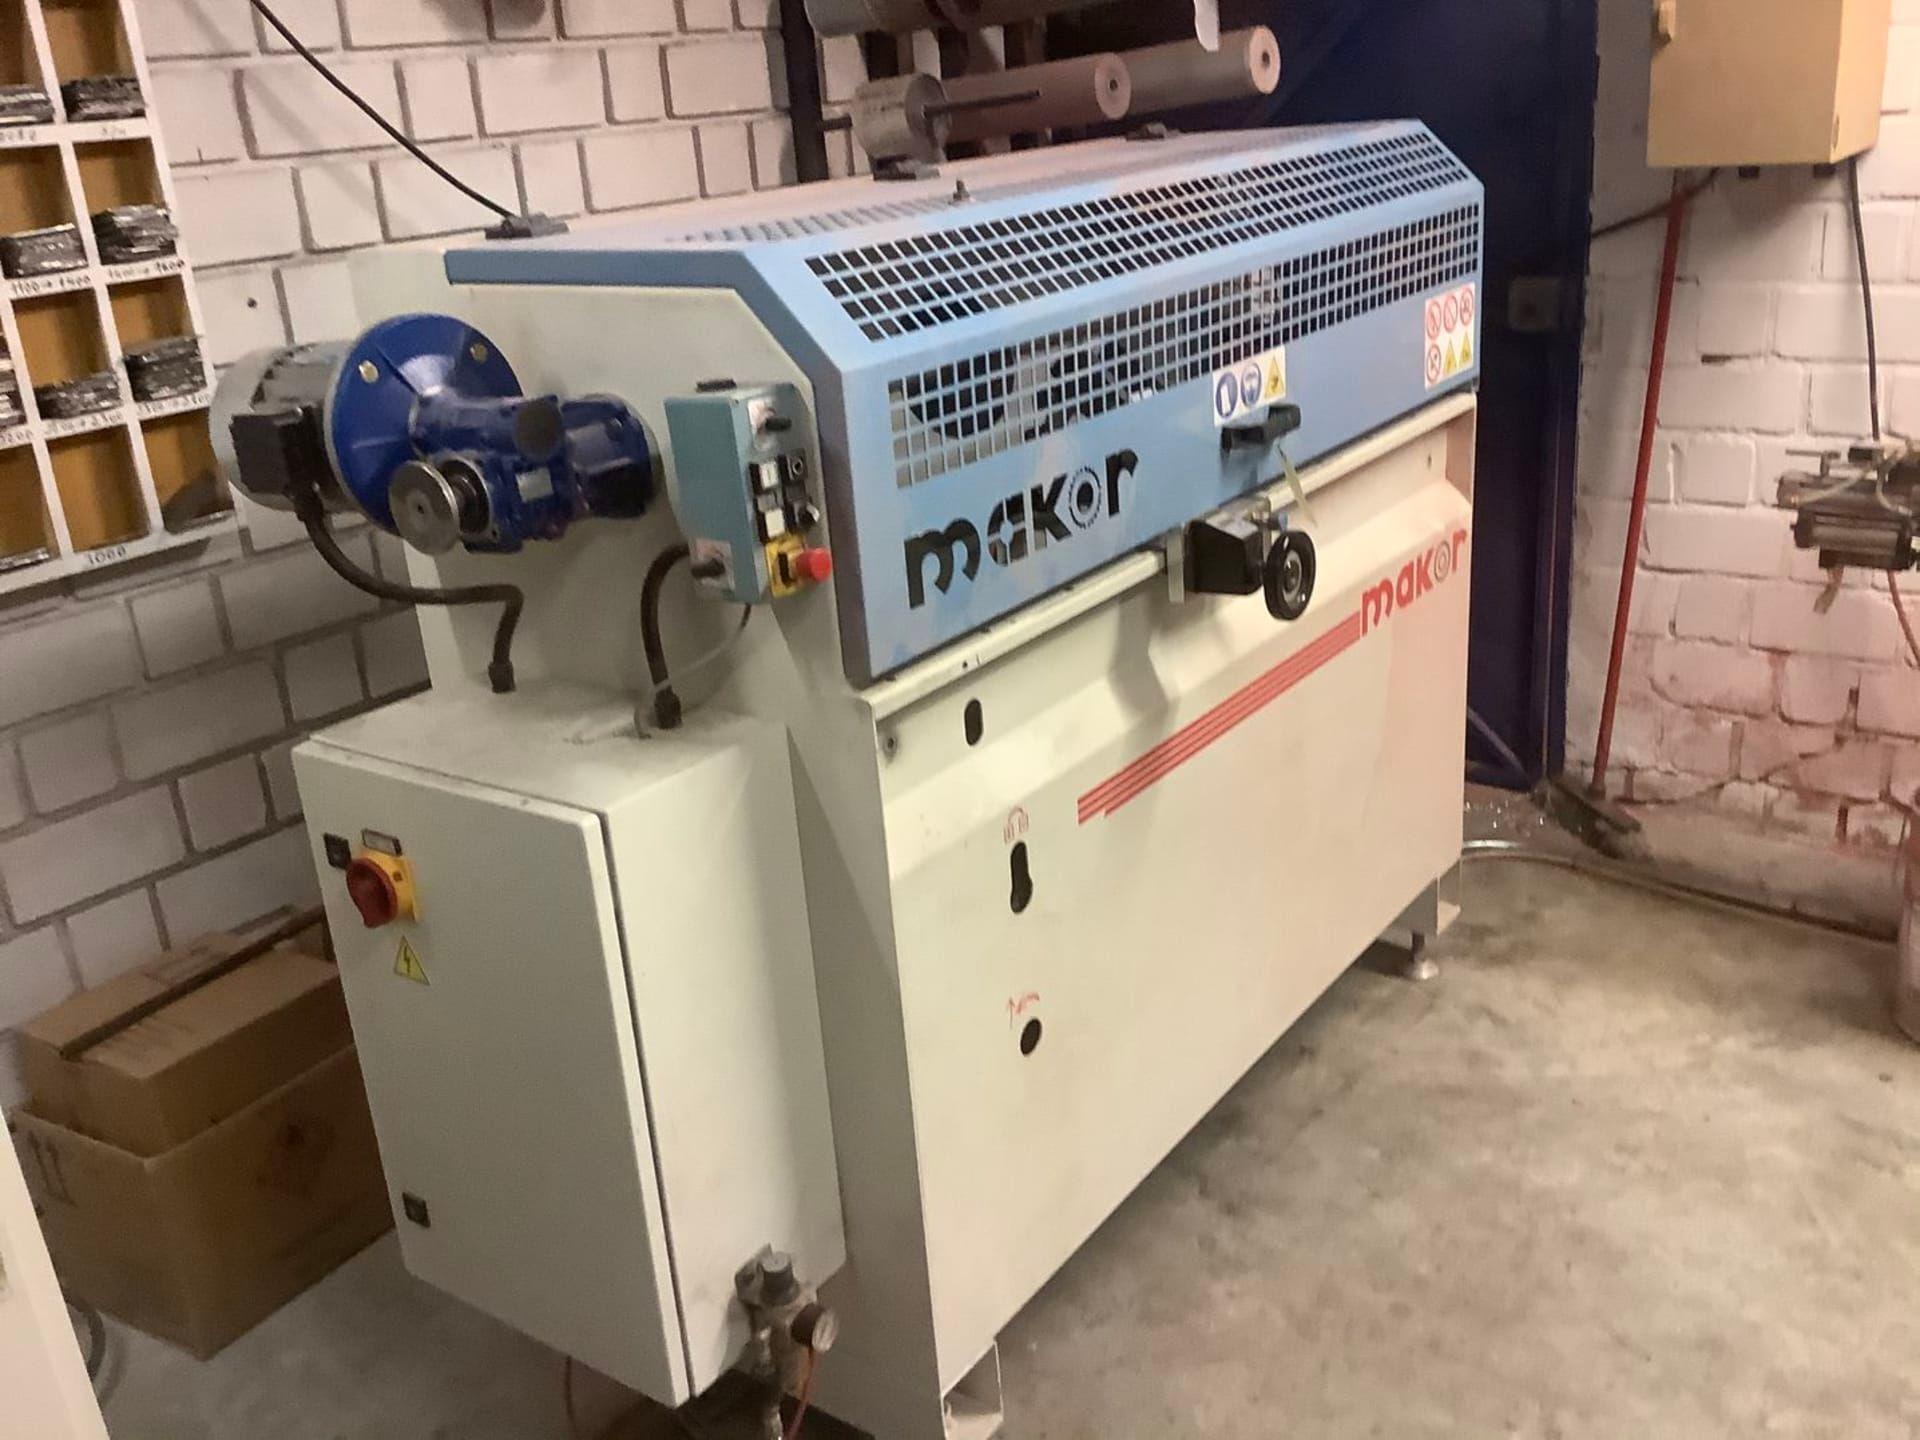 MAKOR T 300 Yapraklı-Schneidemaschine